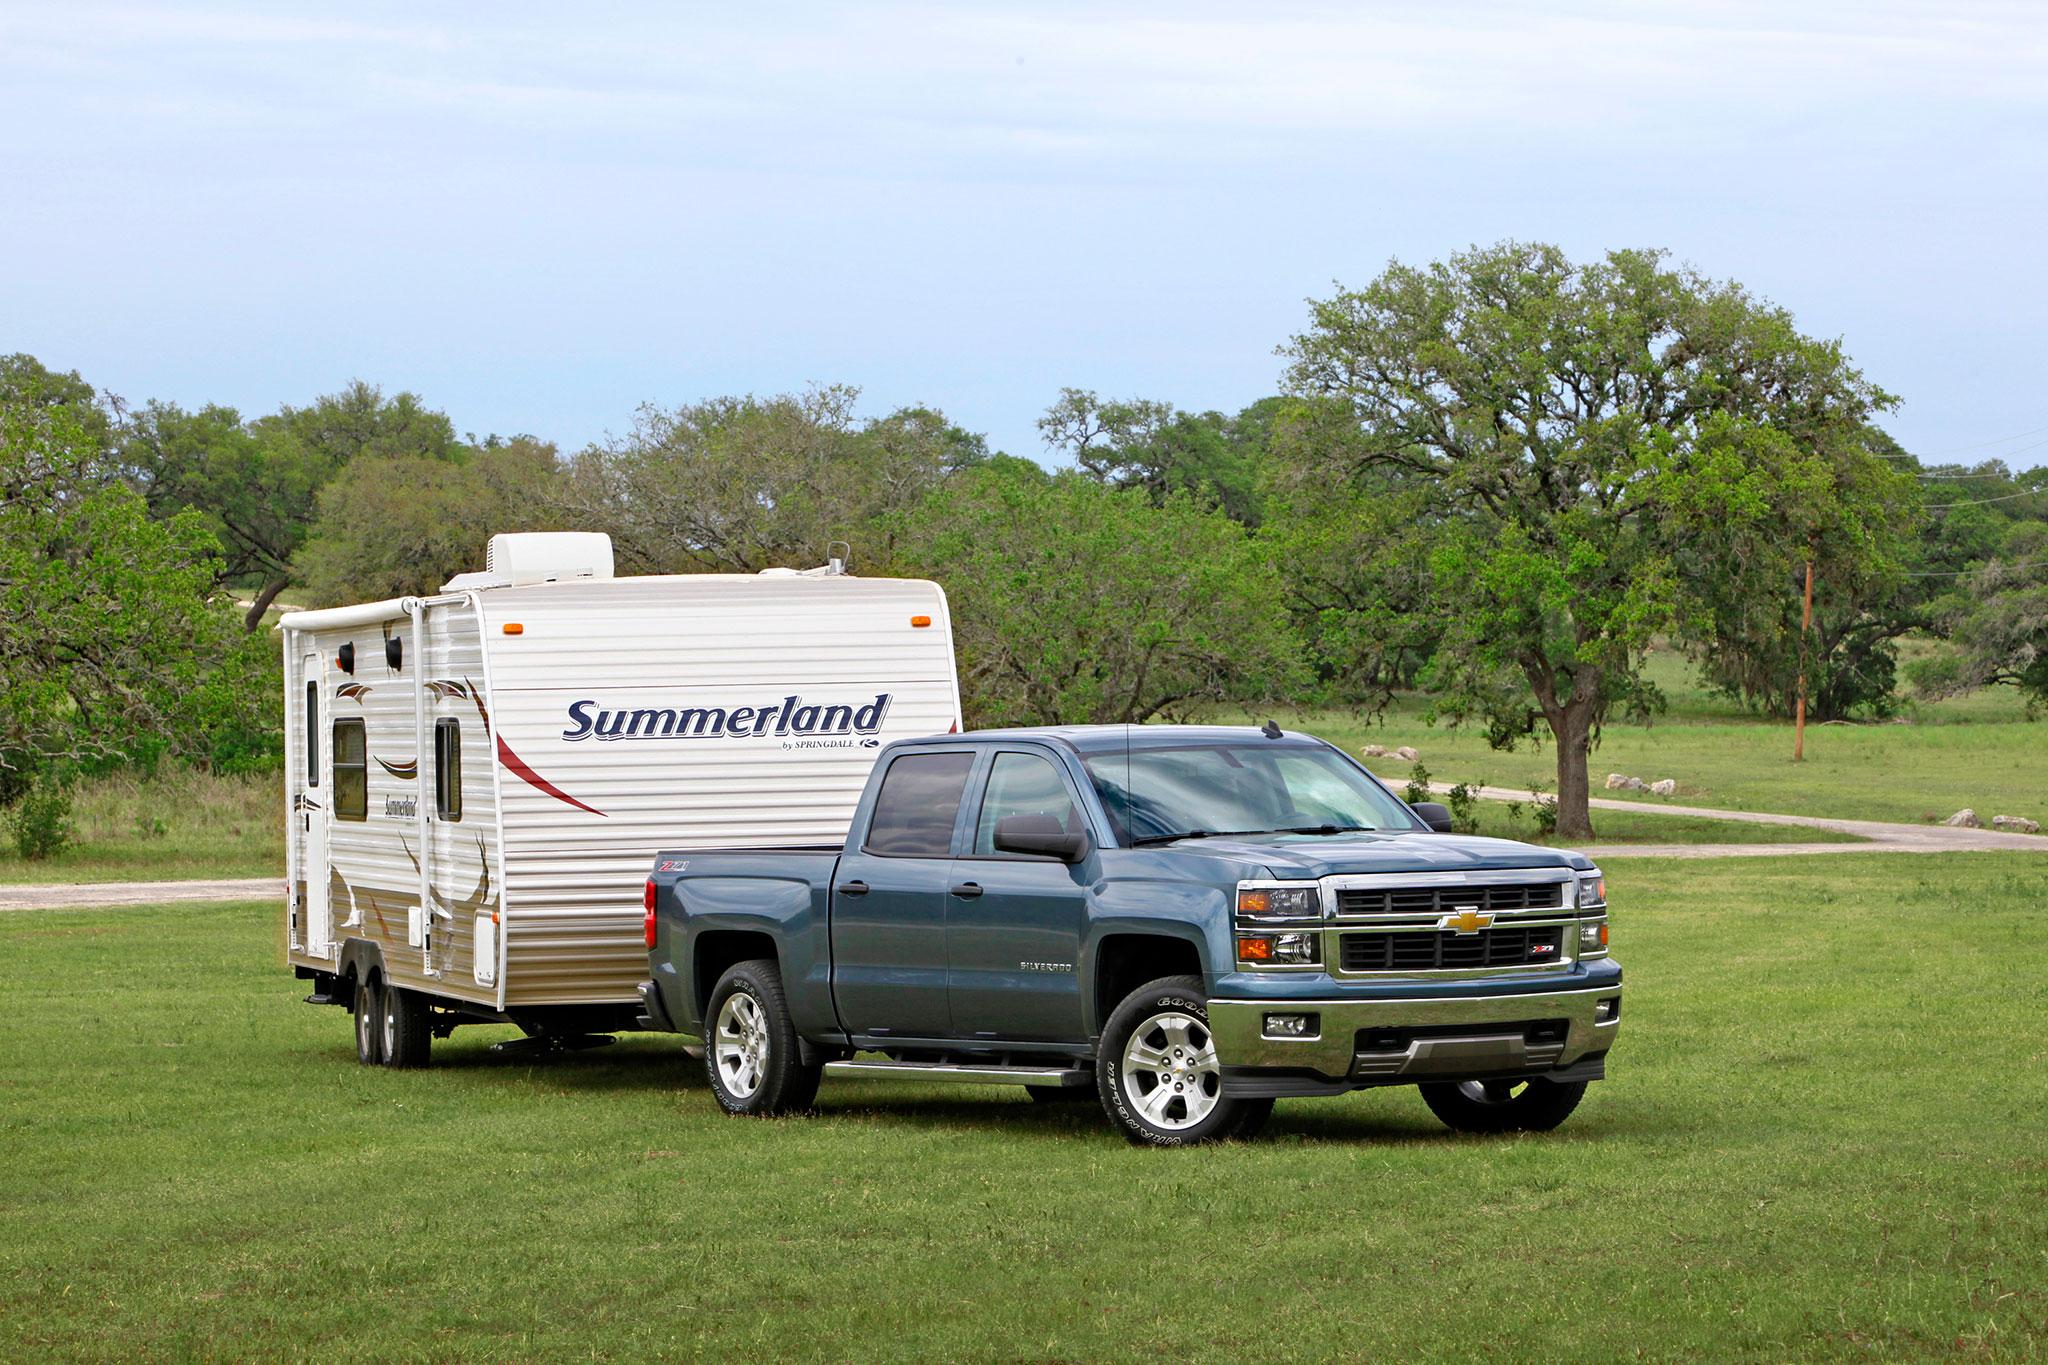 2014 Chevrolet Silverado LTZ Front Passengers Side View Trailer1